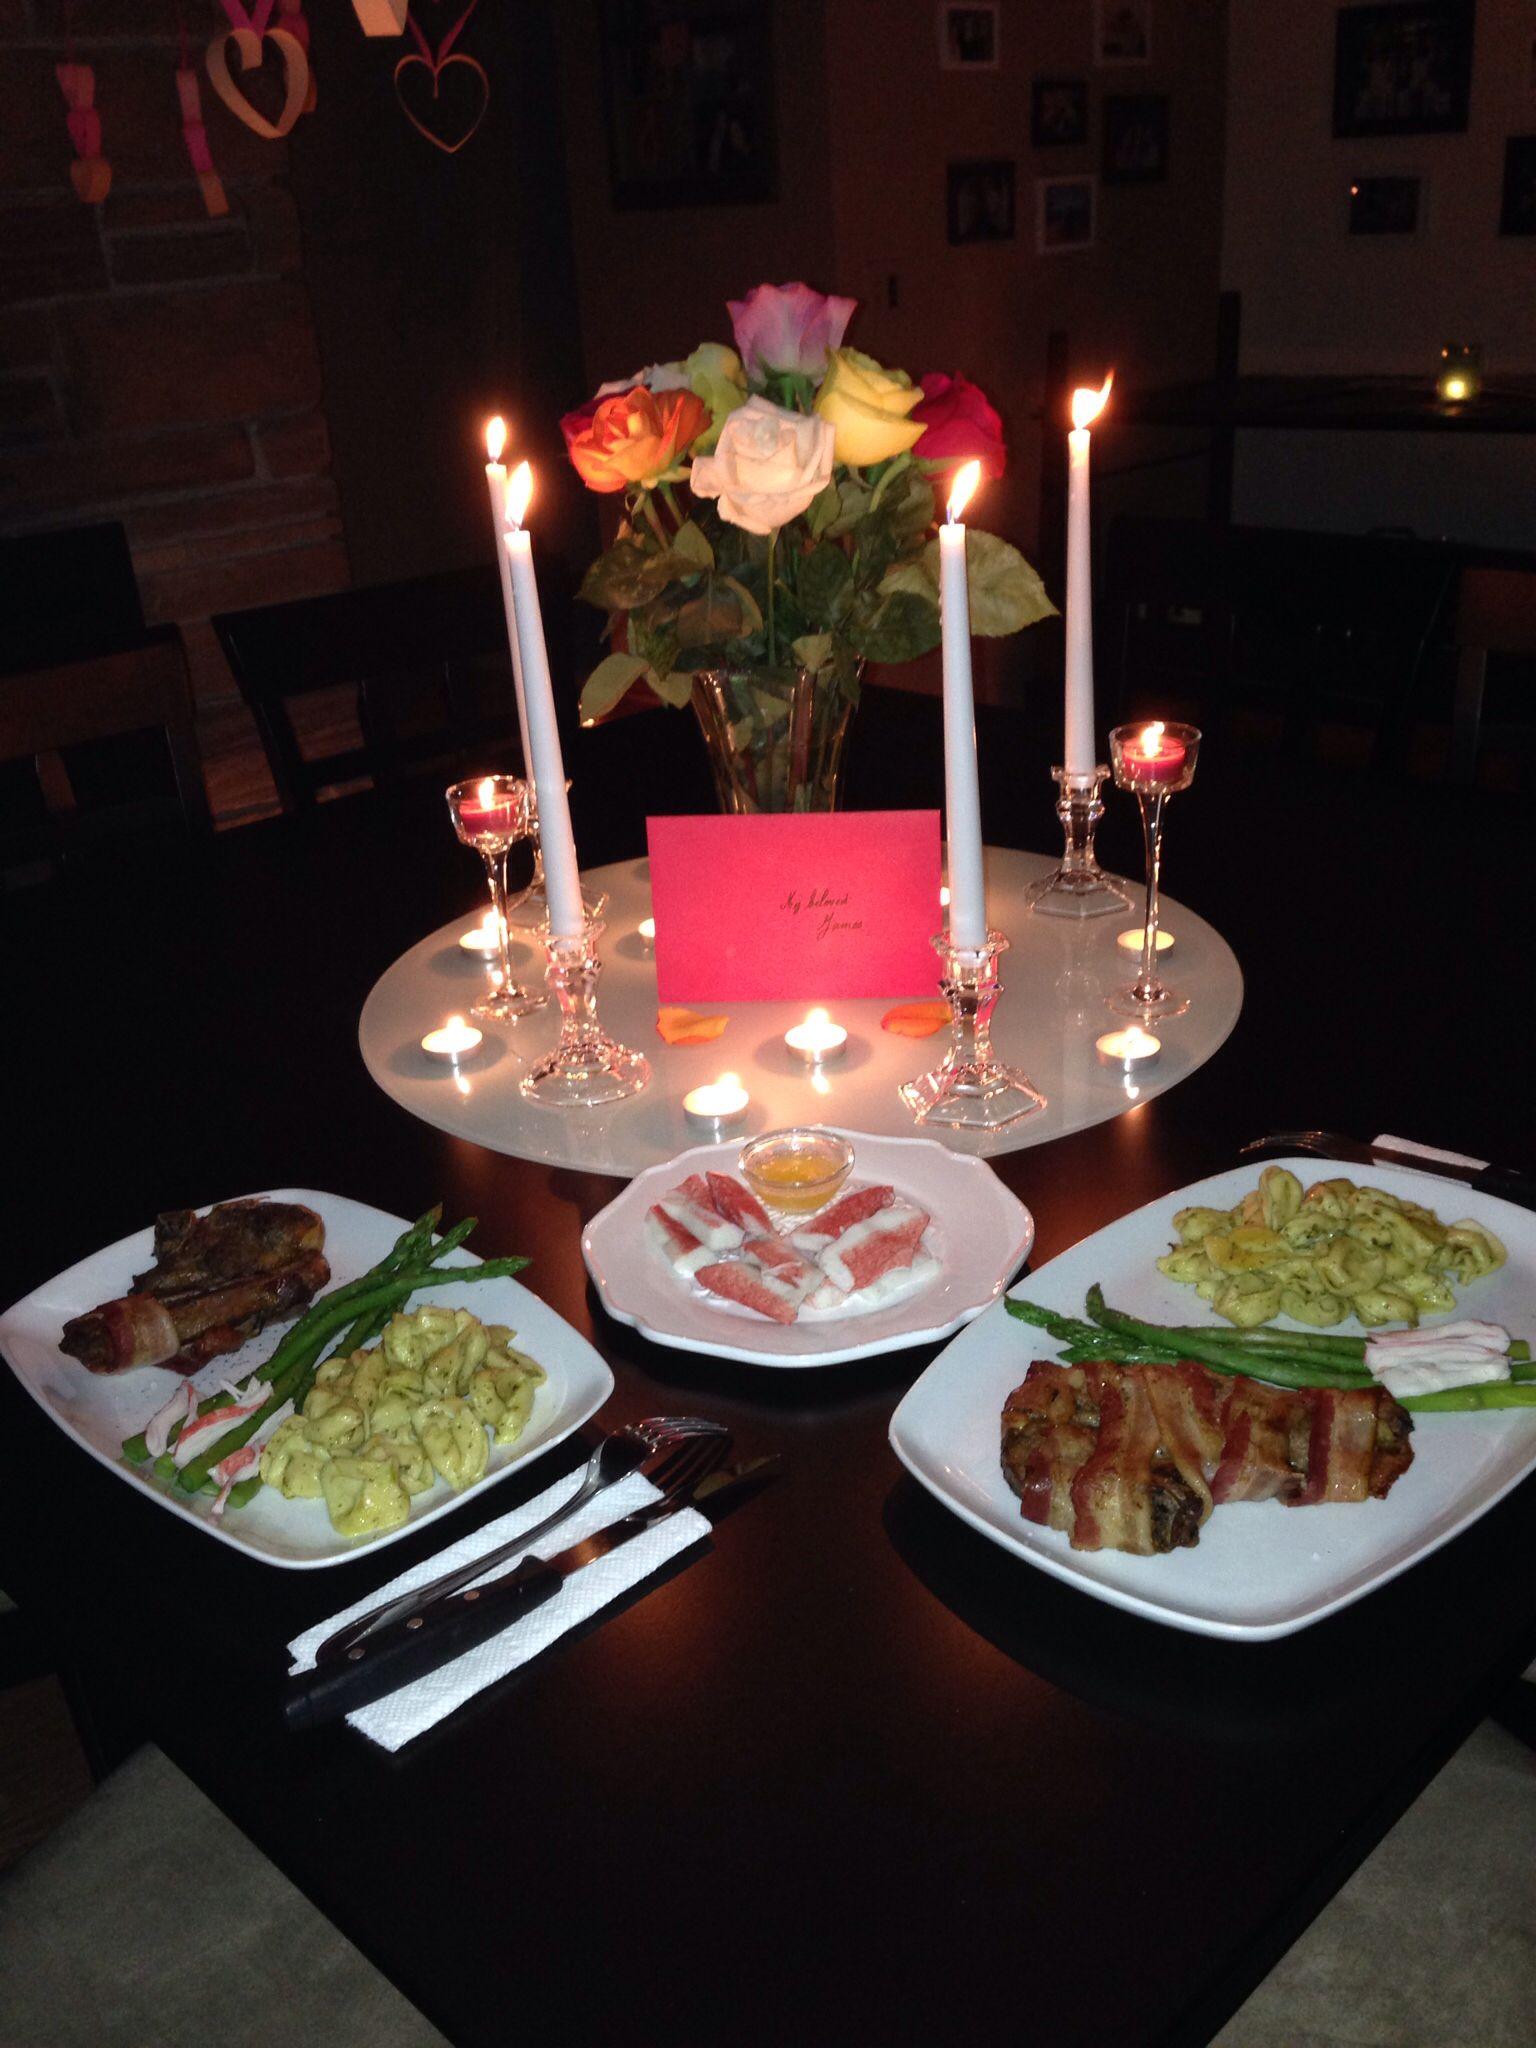 Pin by Vanessa Vu on Candlelight dinner Romantic dinner